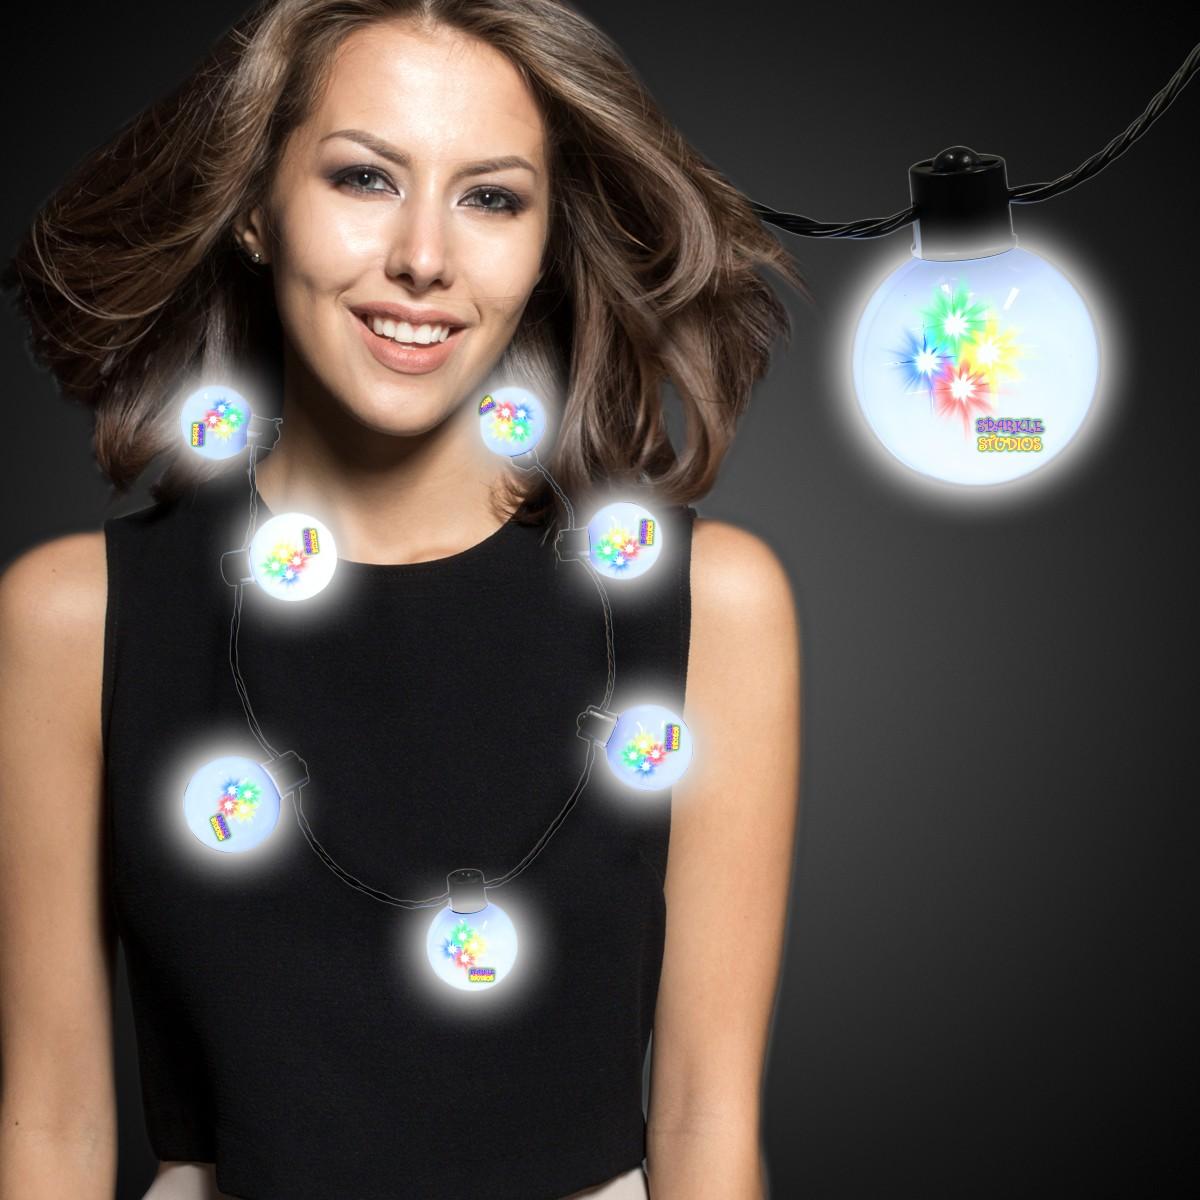 White LED Ball Necklace